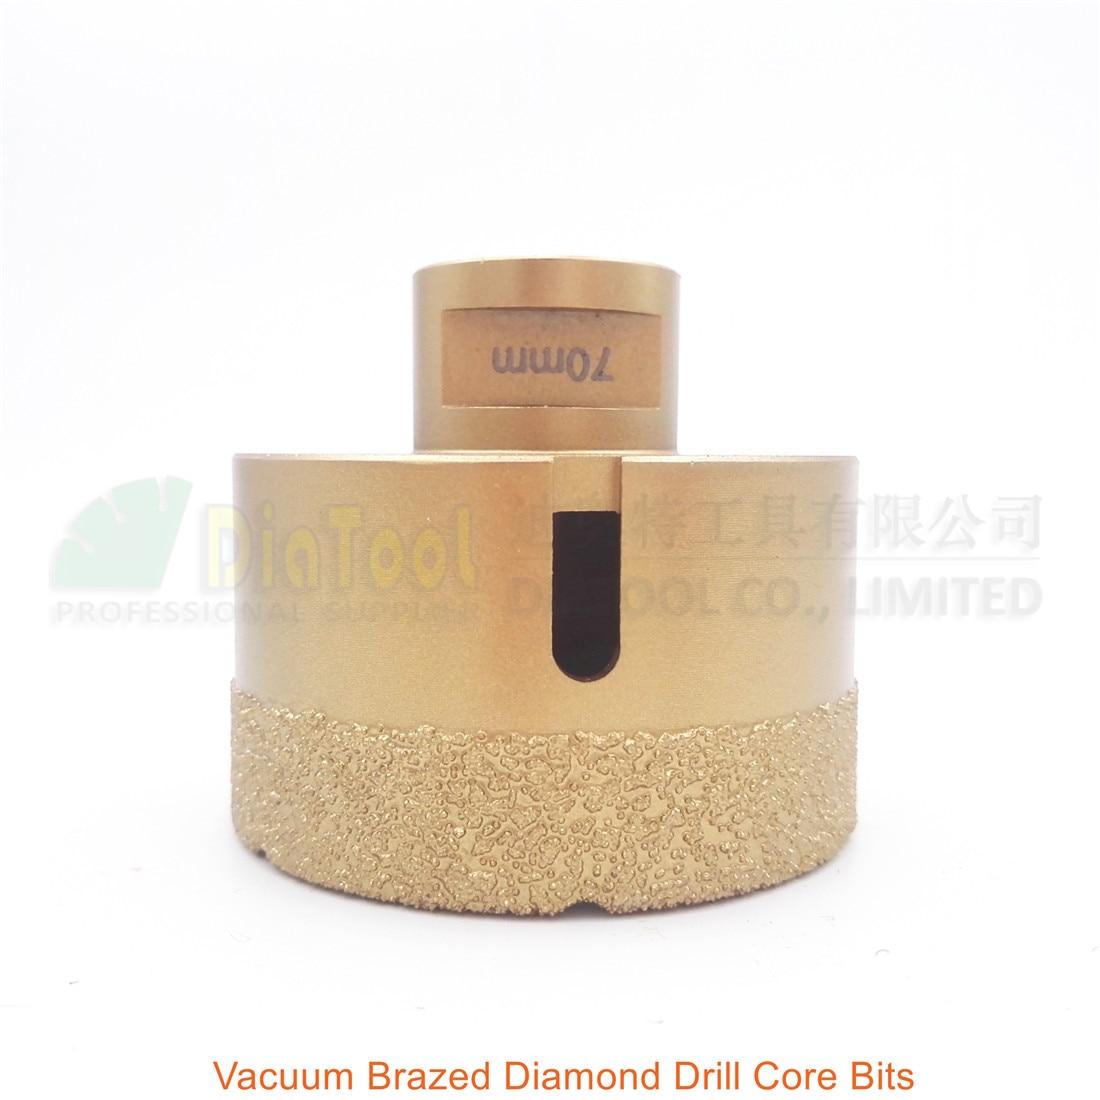 DIATOOL Diameter 70mm Vacuum Brazed Diamond Drilling Core Bits With 15MM Diamond Height Granite Marble Ceramic Hole Saw diatool 2pcs 230mm vacuum brazed diamond